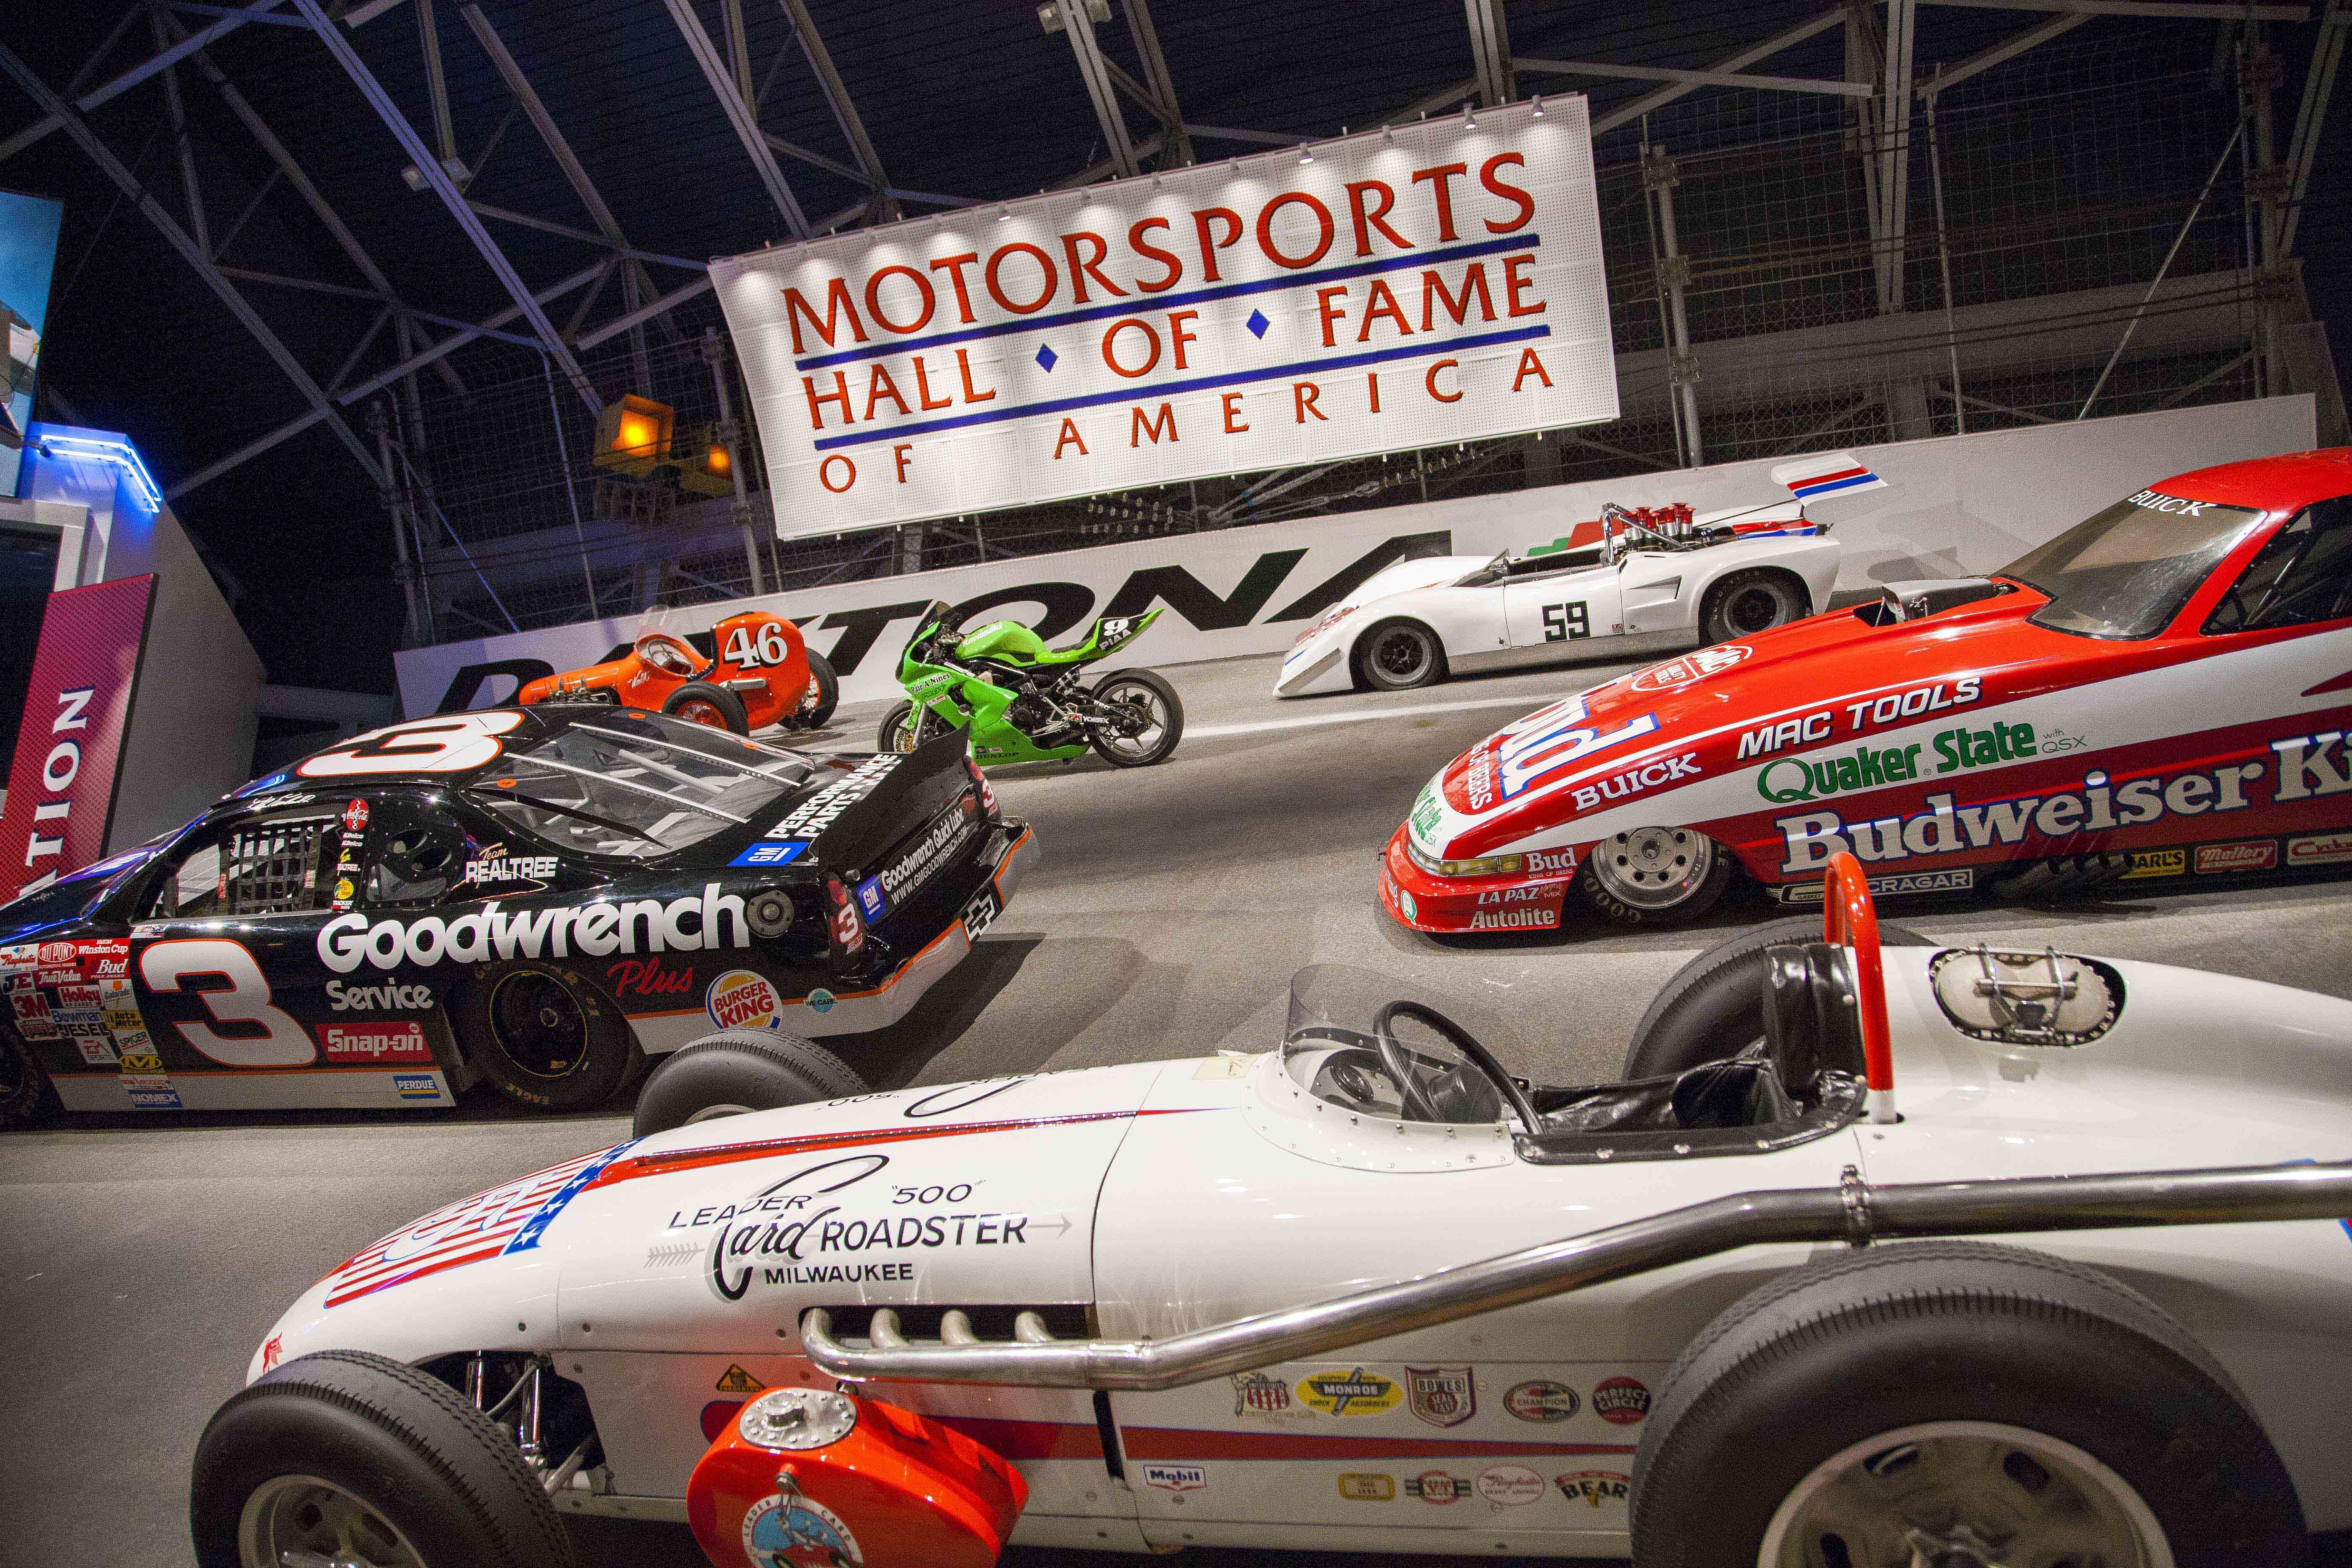 Jack Rouse Associates Exhibit Motorsports Hall of Fame of America